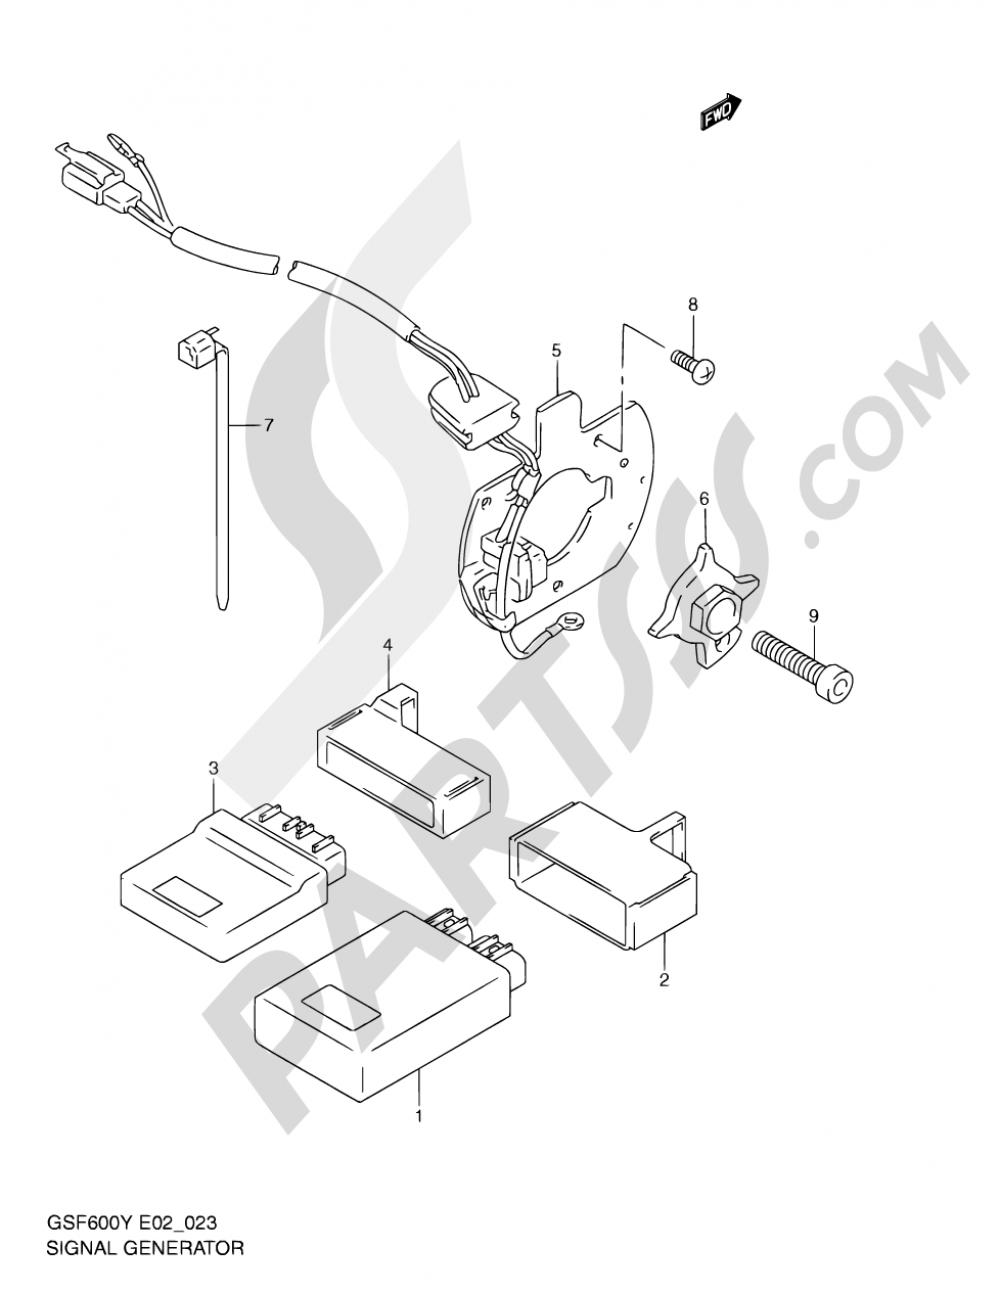 23 - SIGNAL GENERATOR (MODEL Y/K1/K2/K3) Suzuki BANDIT GSF600 2003